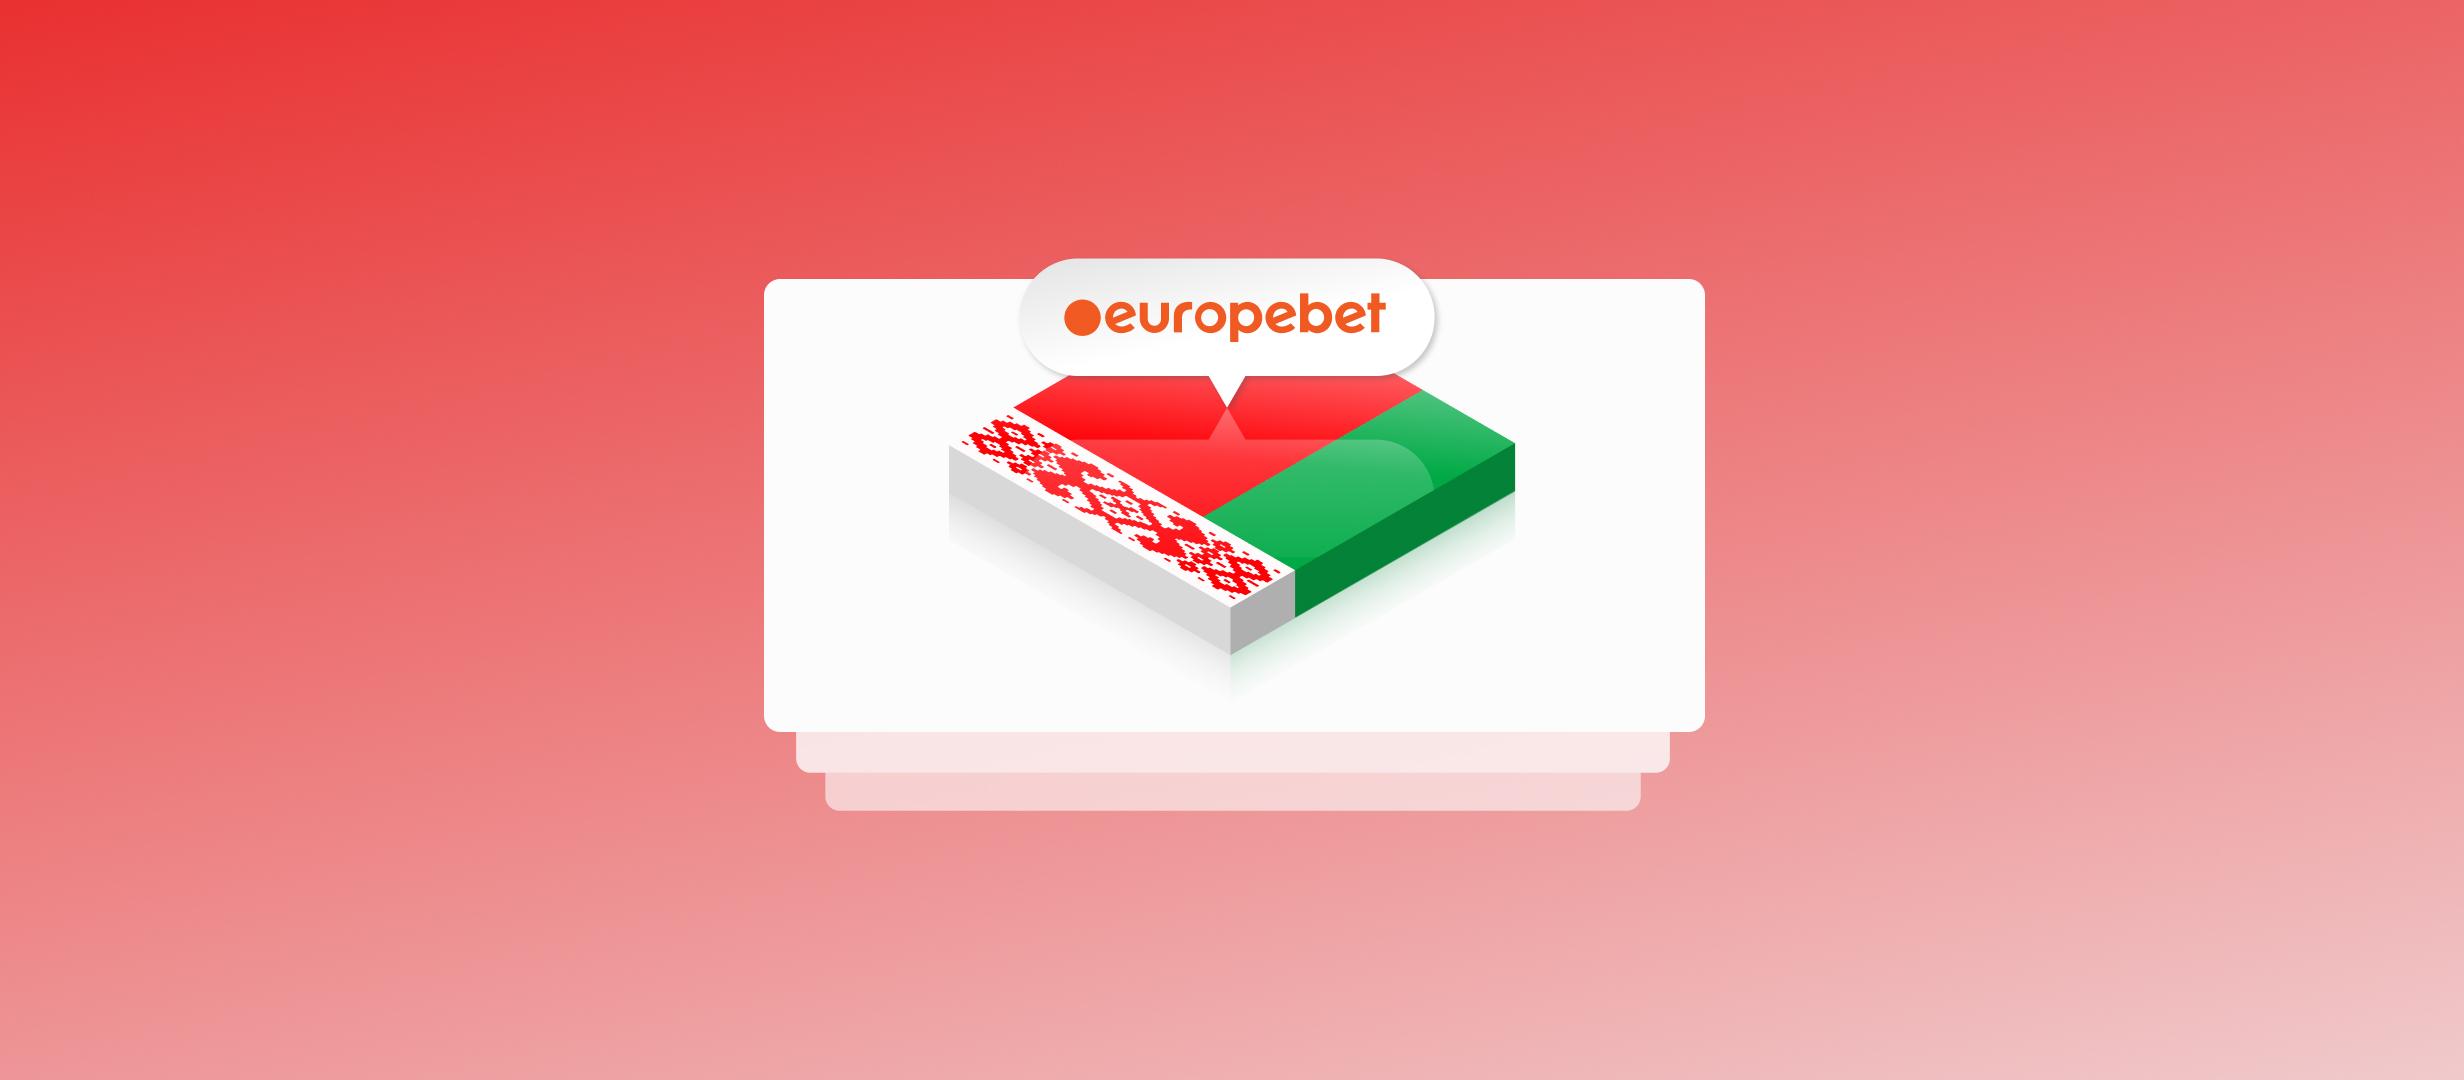 Betsson Group вышла на белорусский рынок с оператором Europebet